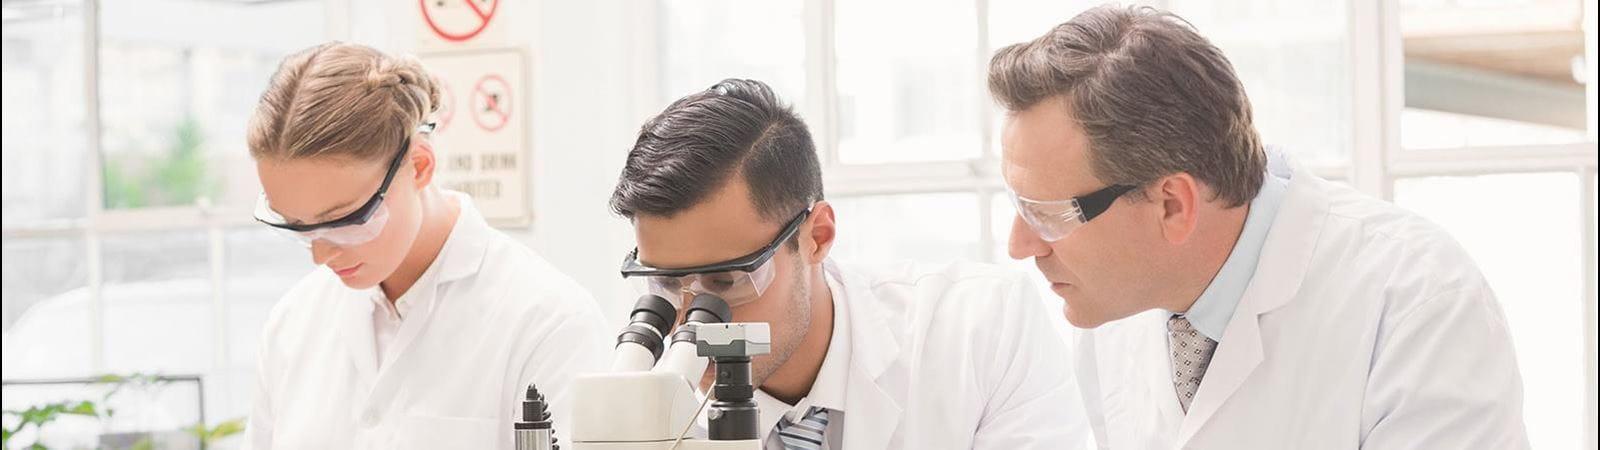 Three researcher in a lab